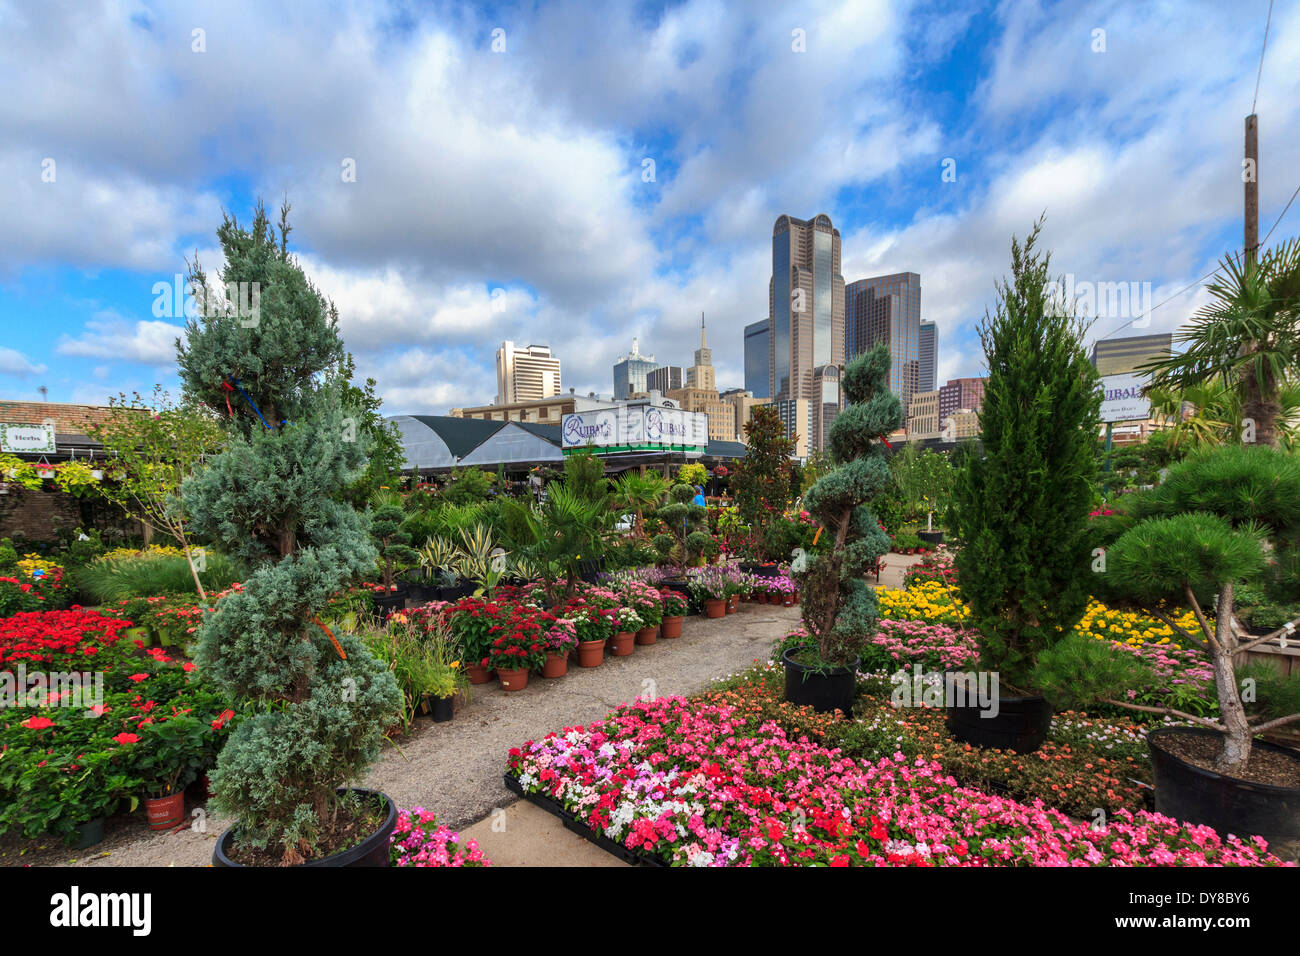 Charming Stock Photo   Colourful, Dallas, Farmers Market, Garden Center, Nursery,  Ruibal, Skyline, Texas, USA, United States, America